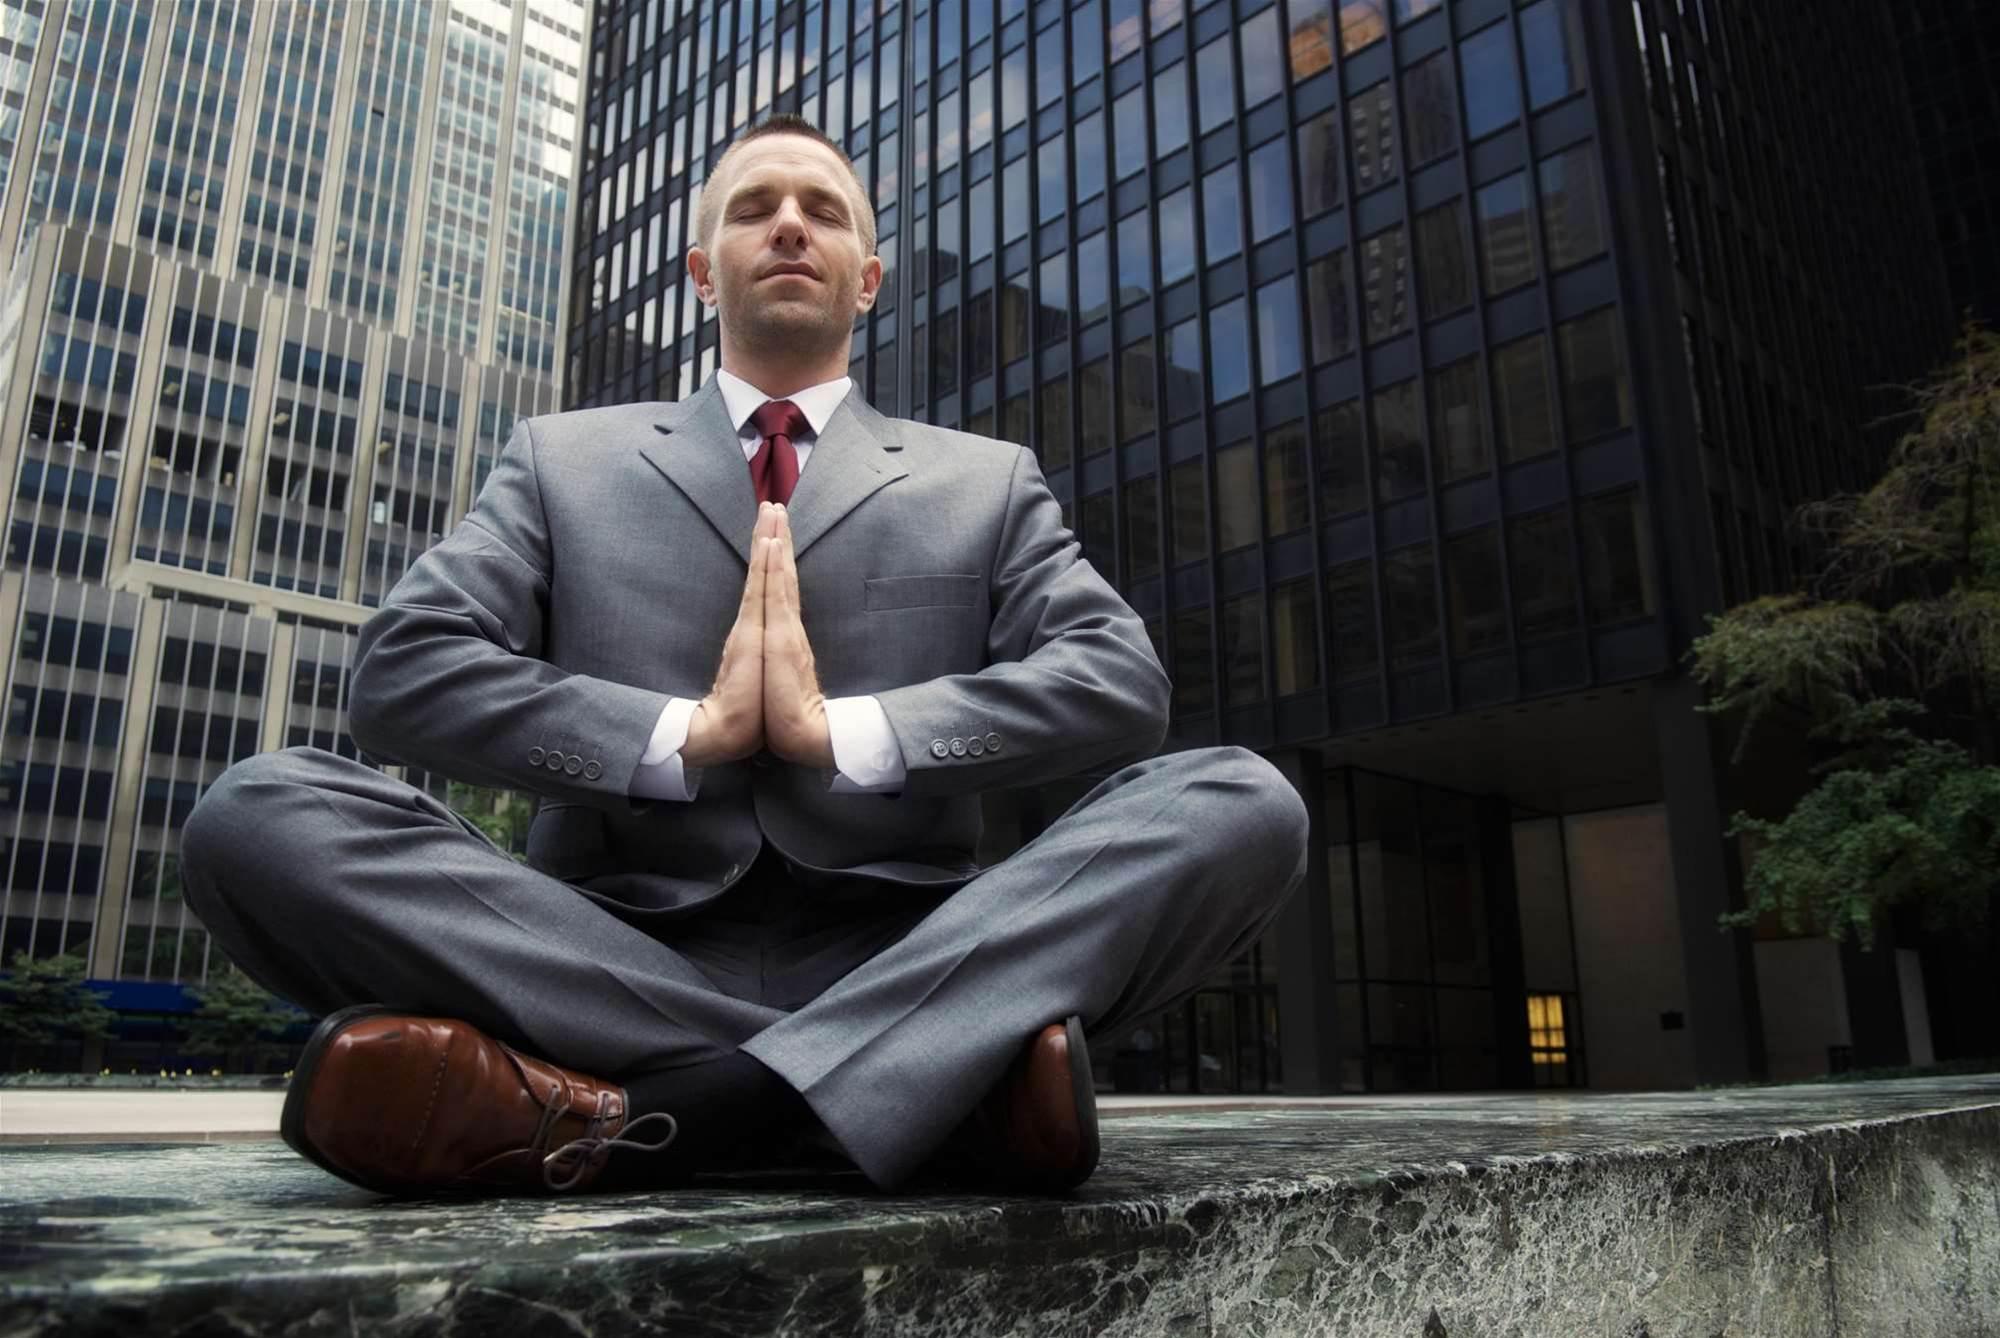 Six things CIOs can learn from bikram yoga